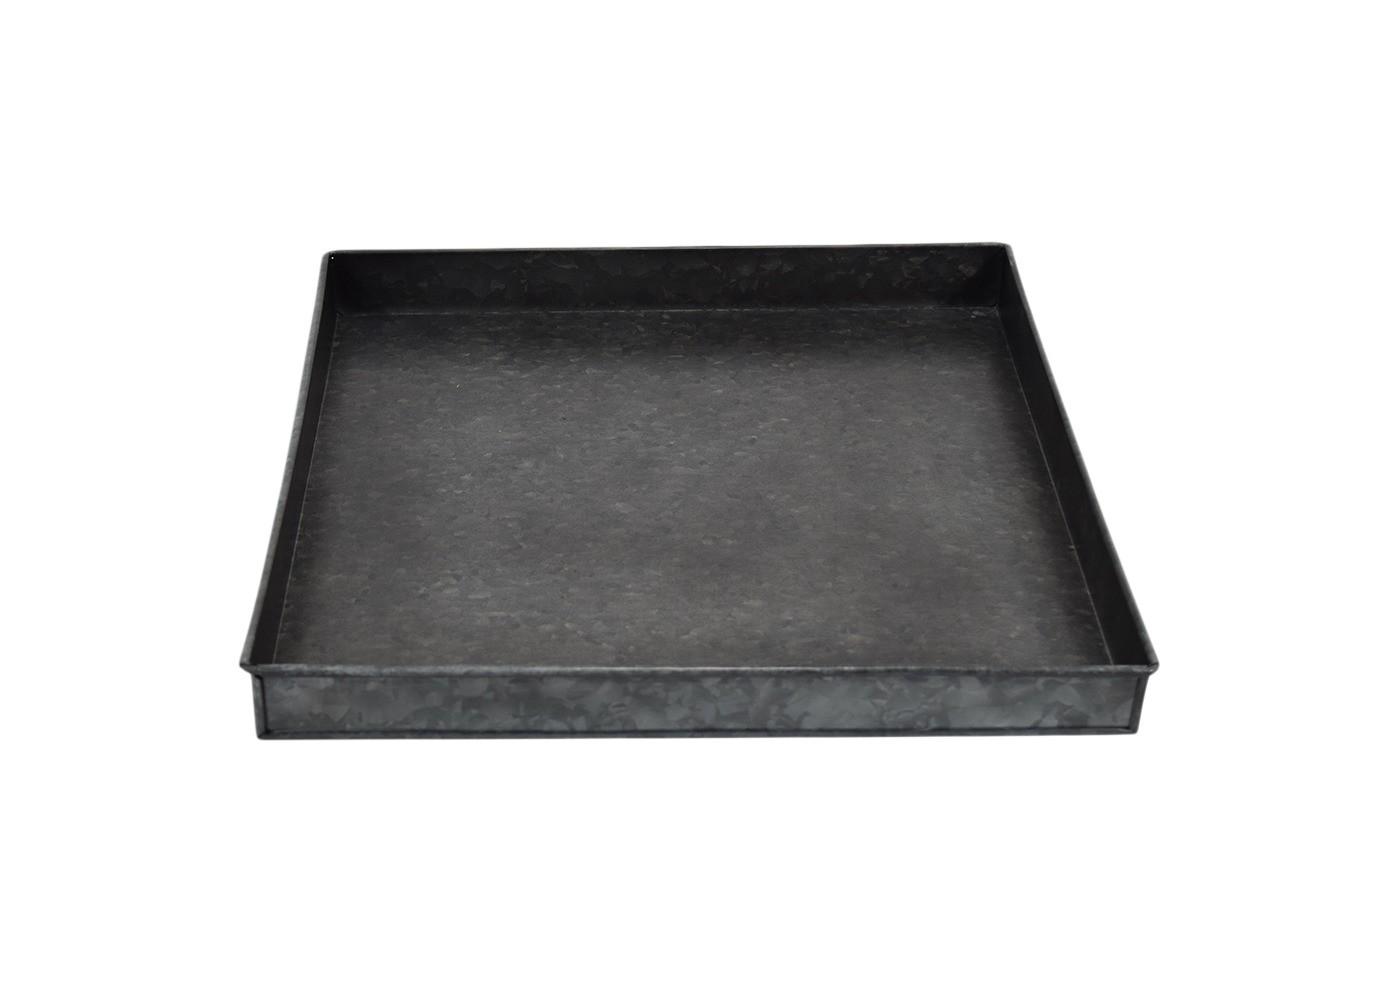 Galvanized Iron Tray